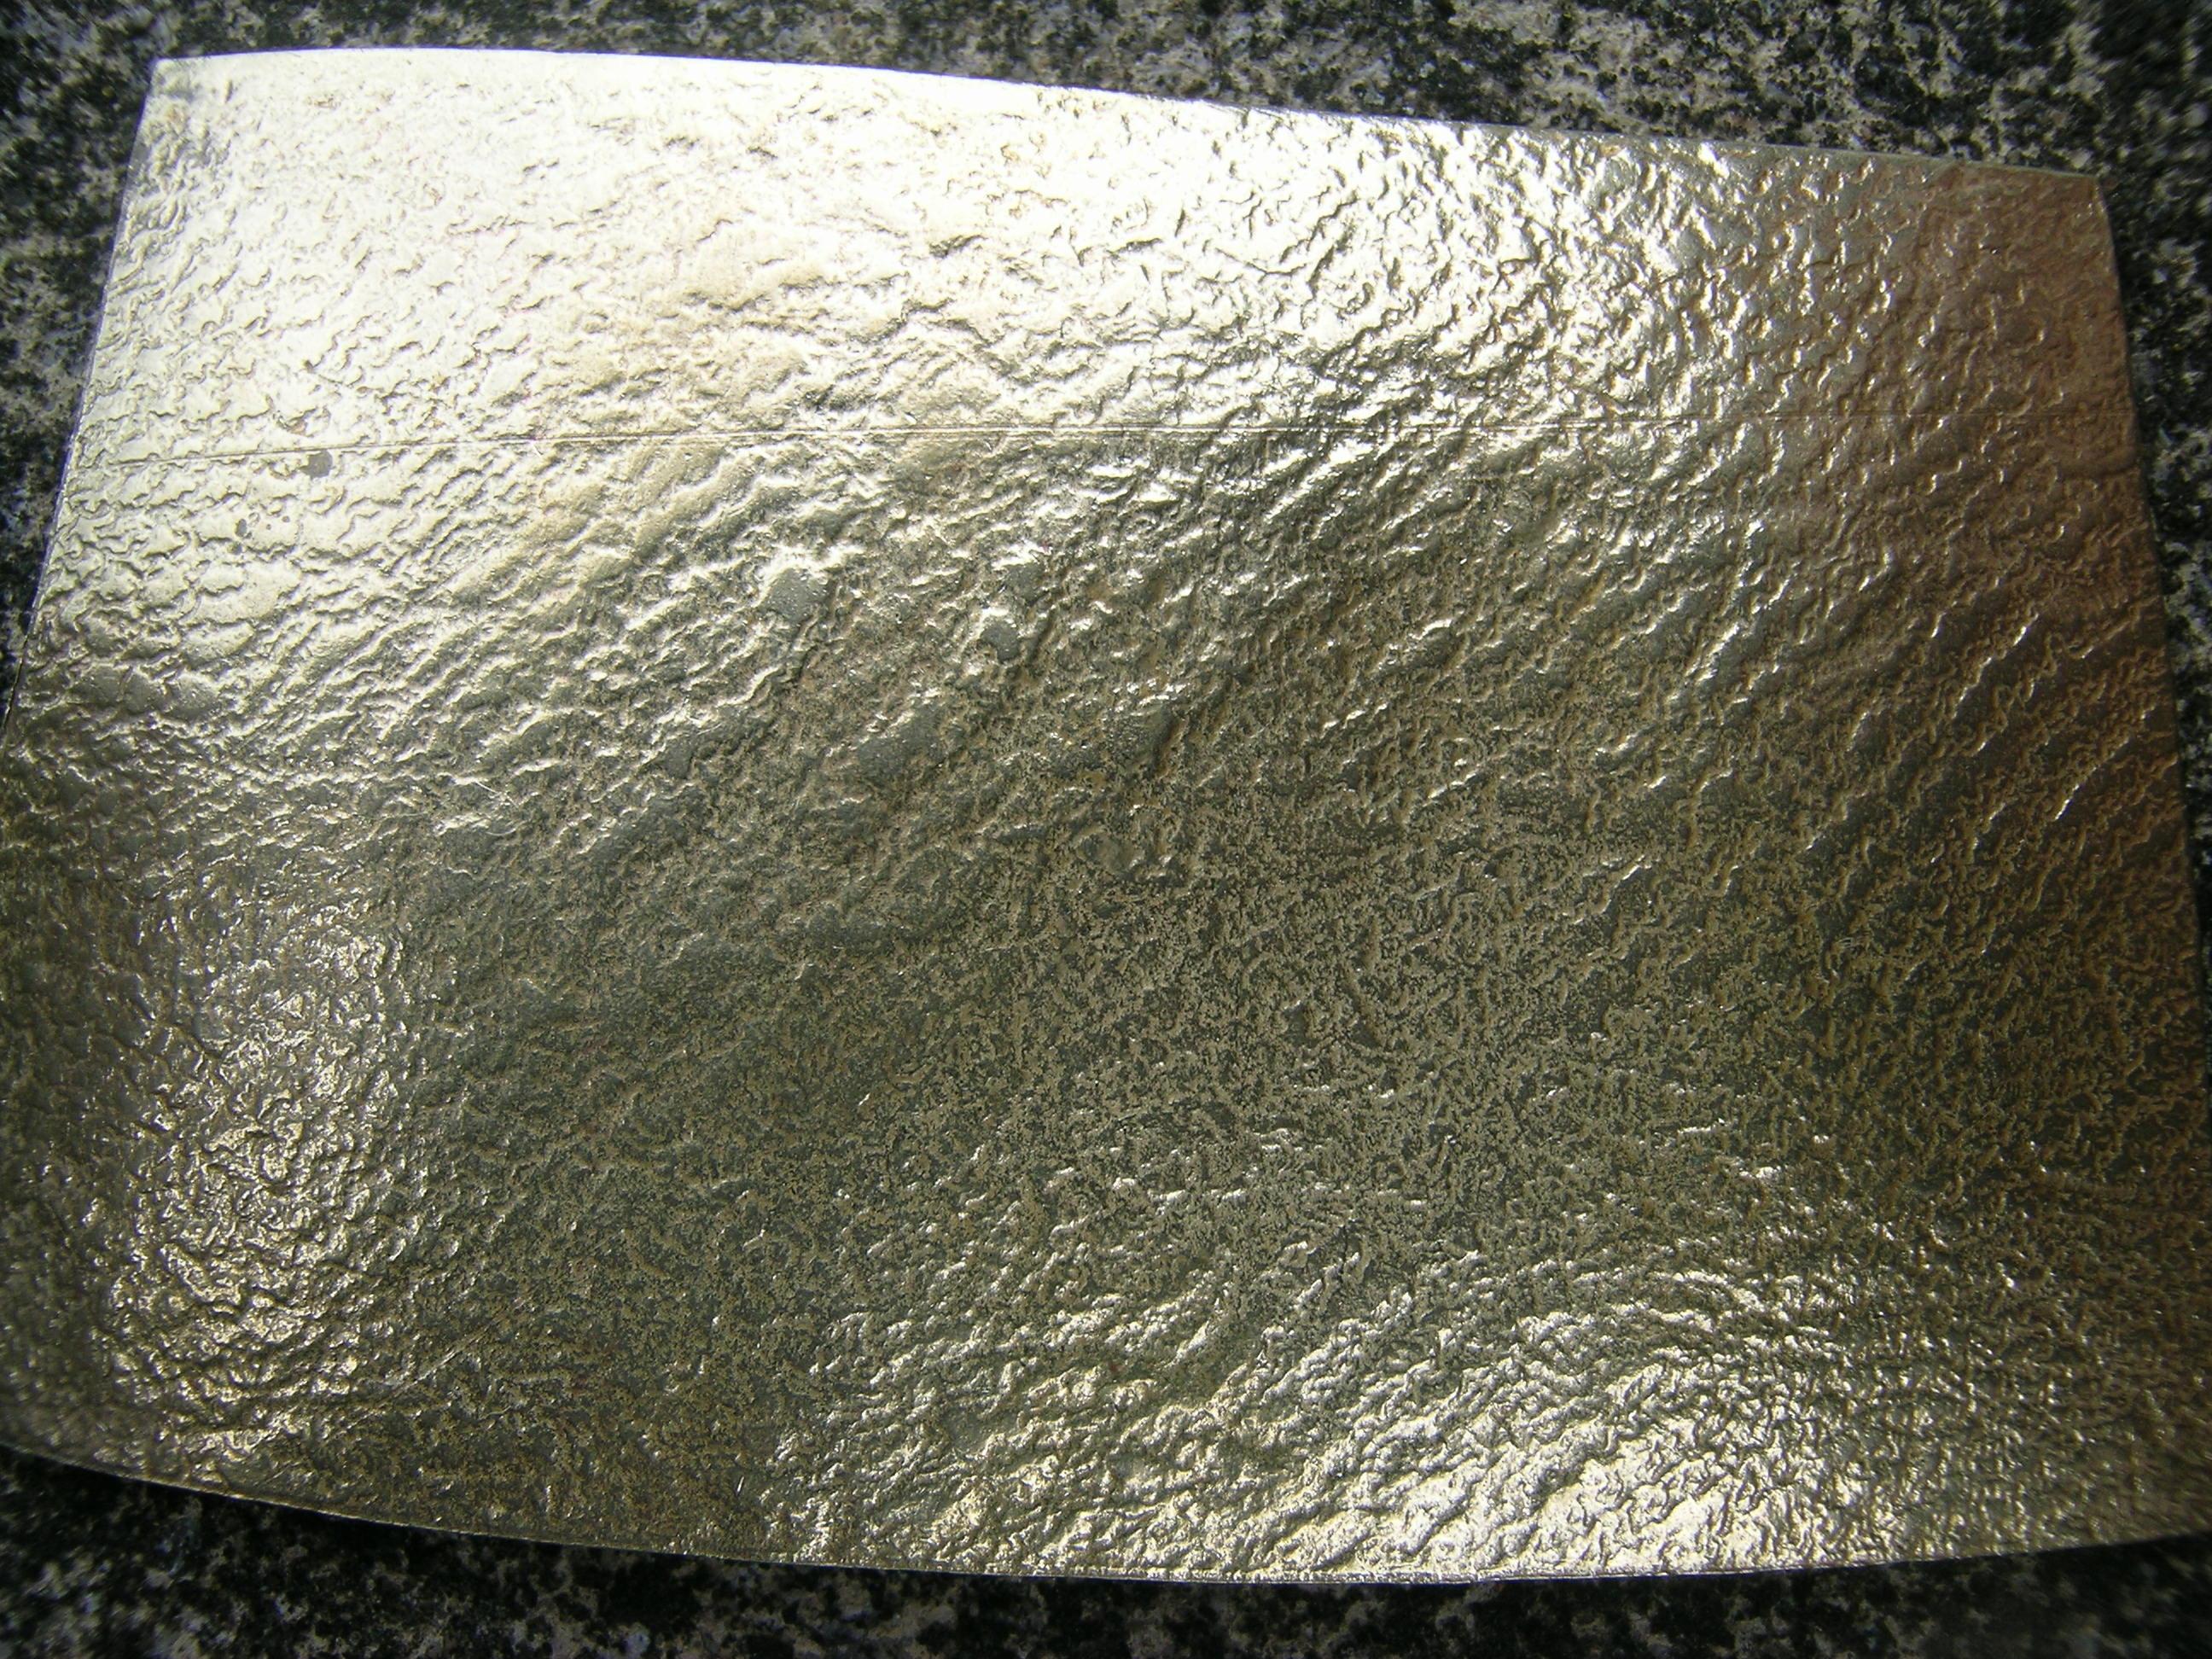 Brass Metal Texture Lace Texture on Brass